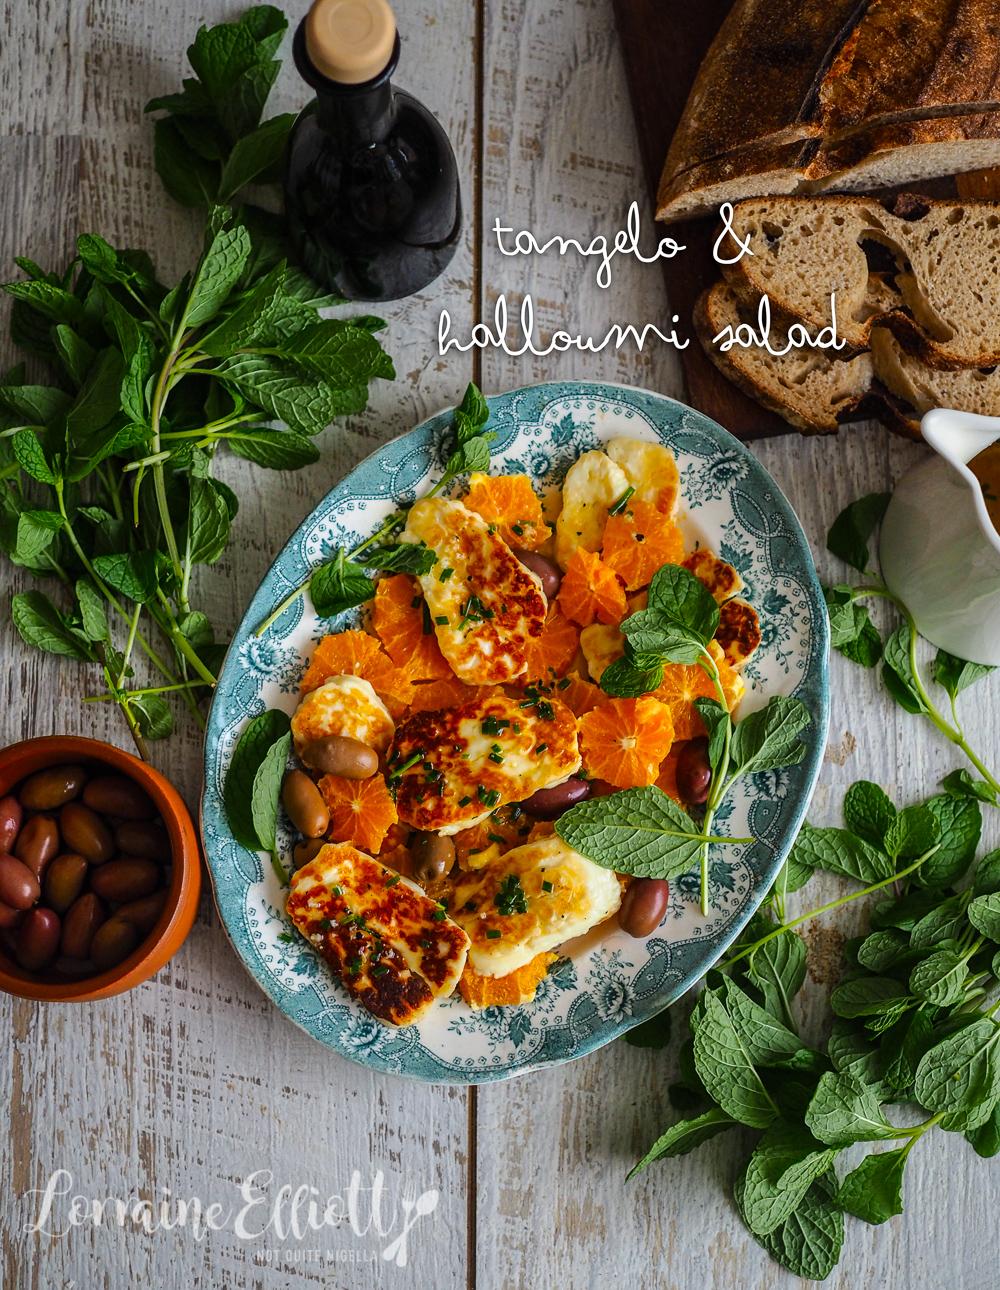 Tangelo, Halloumi & Olive Winter Salad